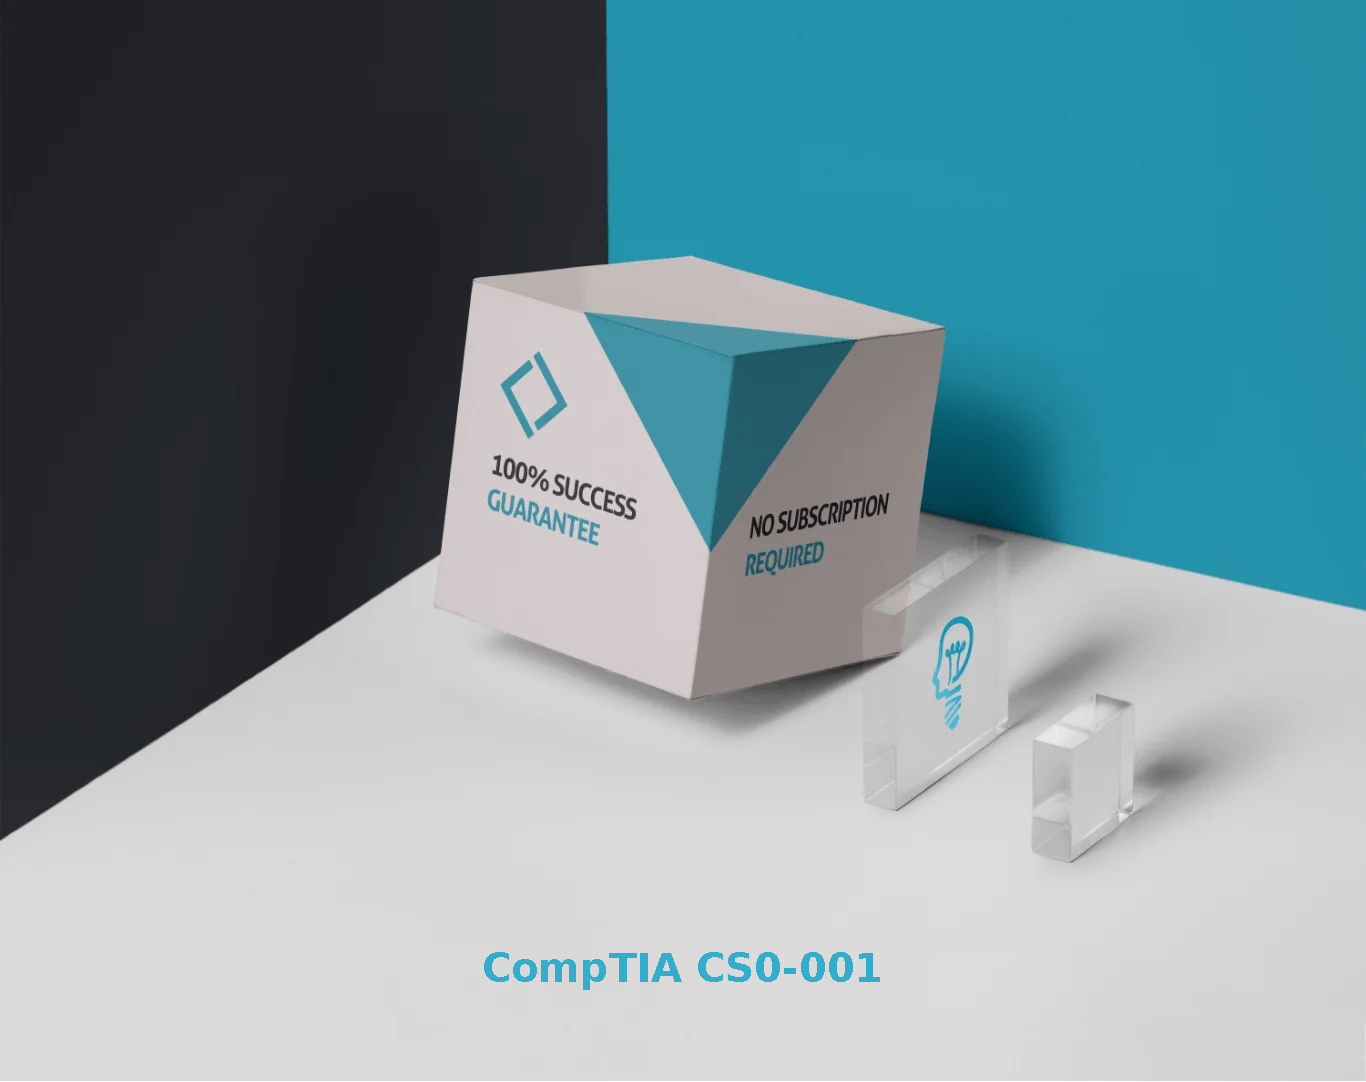 CS0-001 Dumps